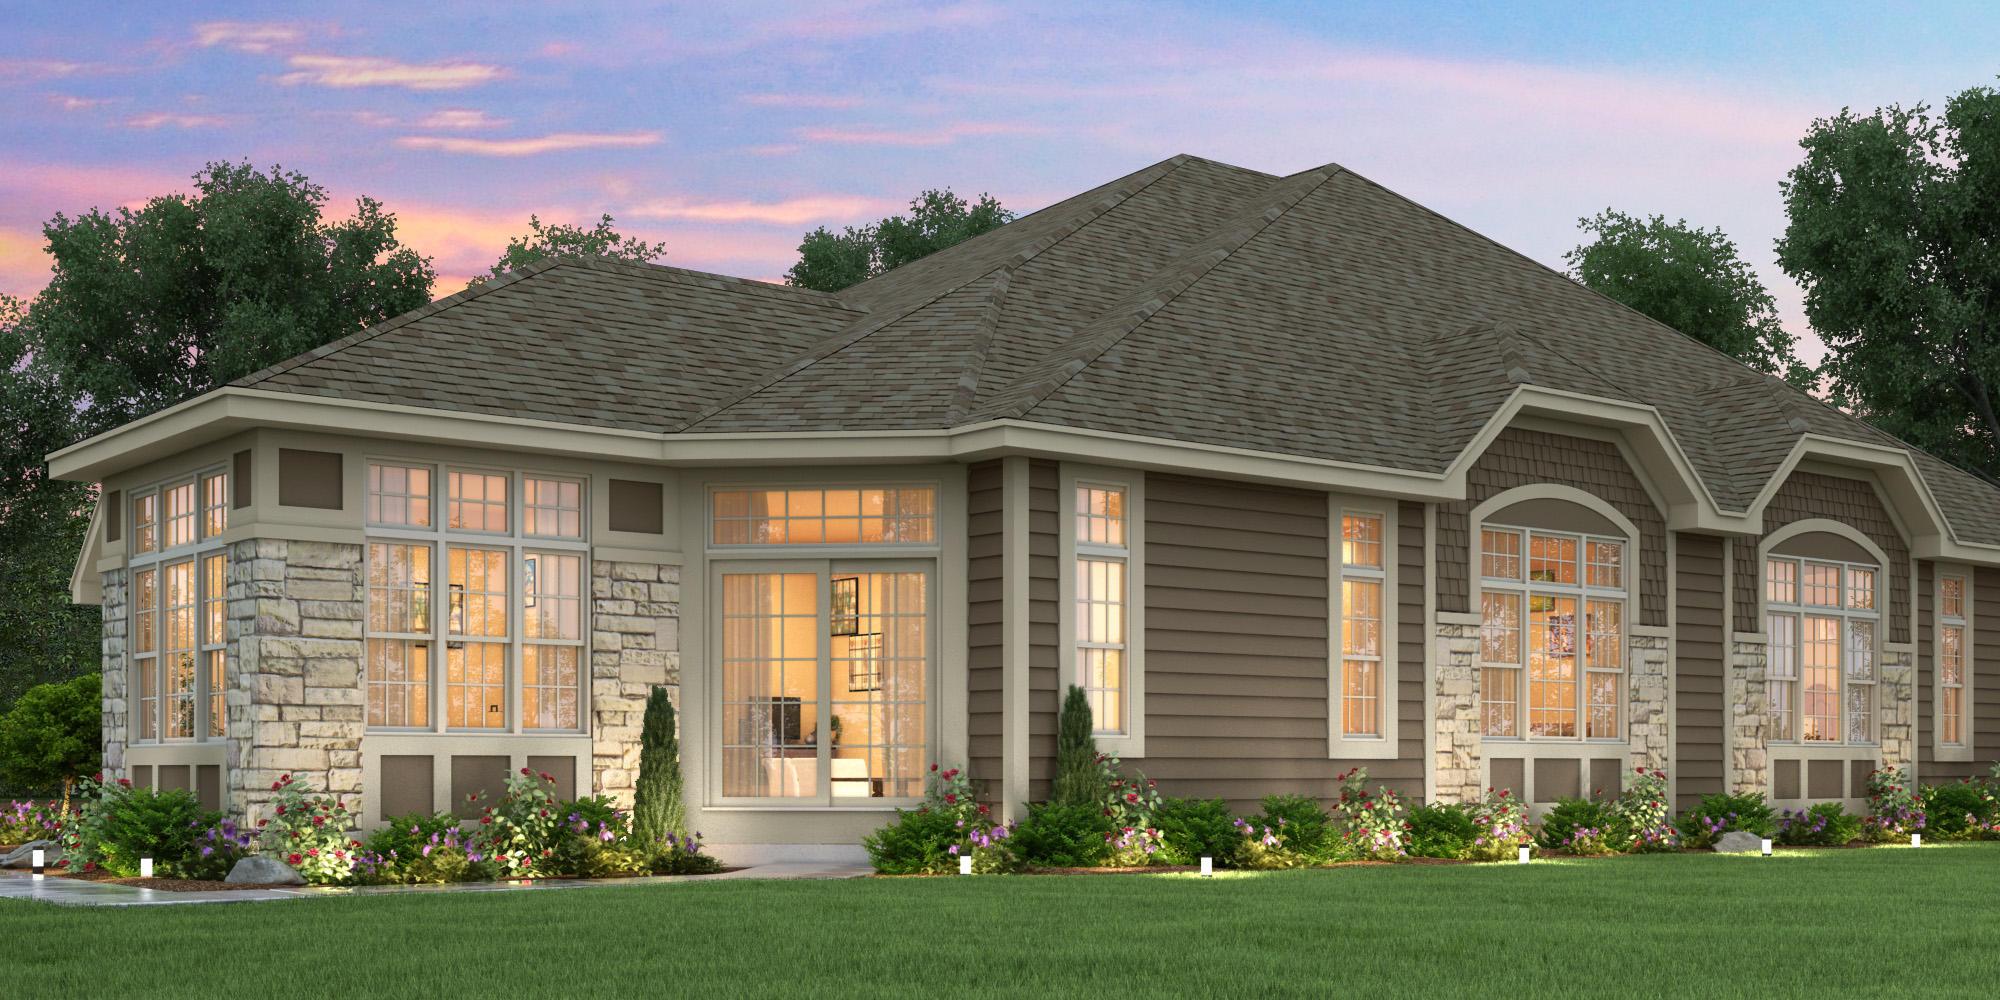 13765 Creekside Pass, Brookfield, Wisconsin 53005, 2 Bedrooms Bedrooms, 6 Rooms Rooms,2 BathroomsBathrooms,Condominiums,For Sale,Creekside Pass,1,1711947